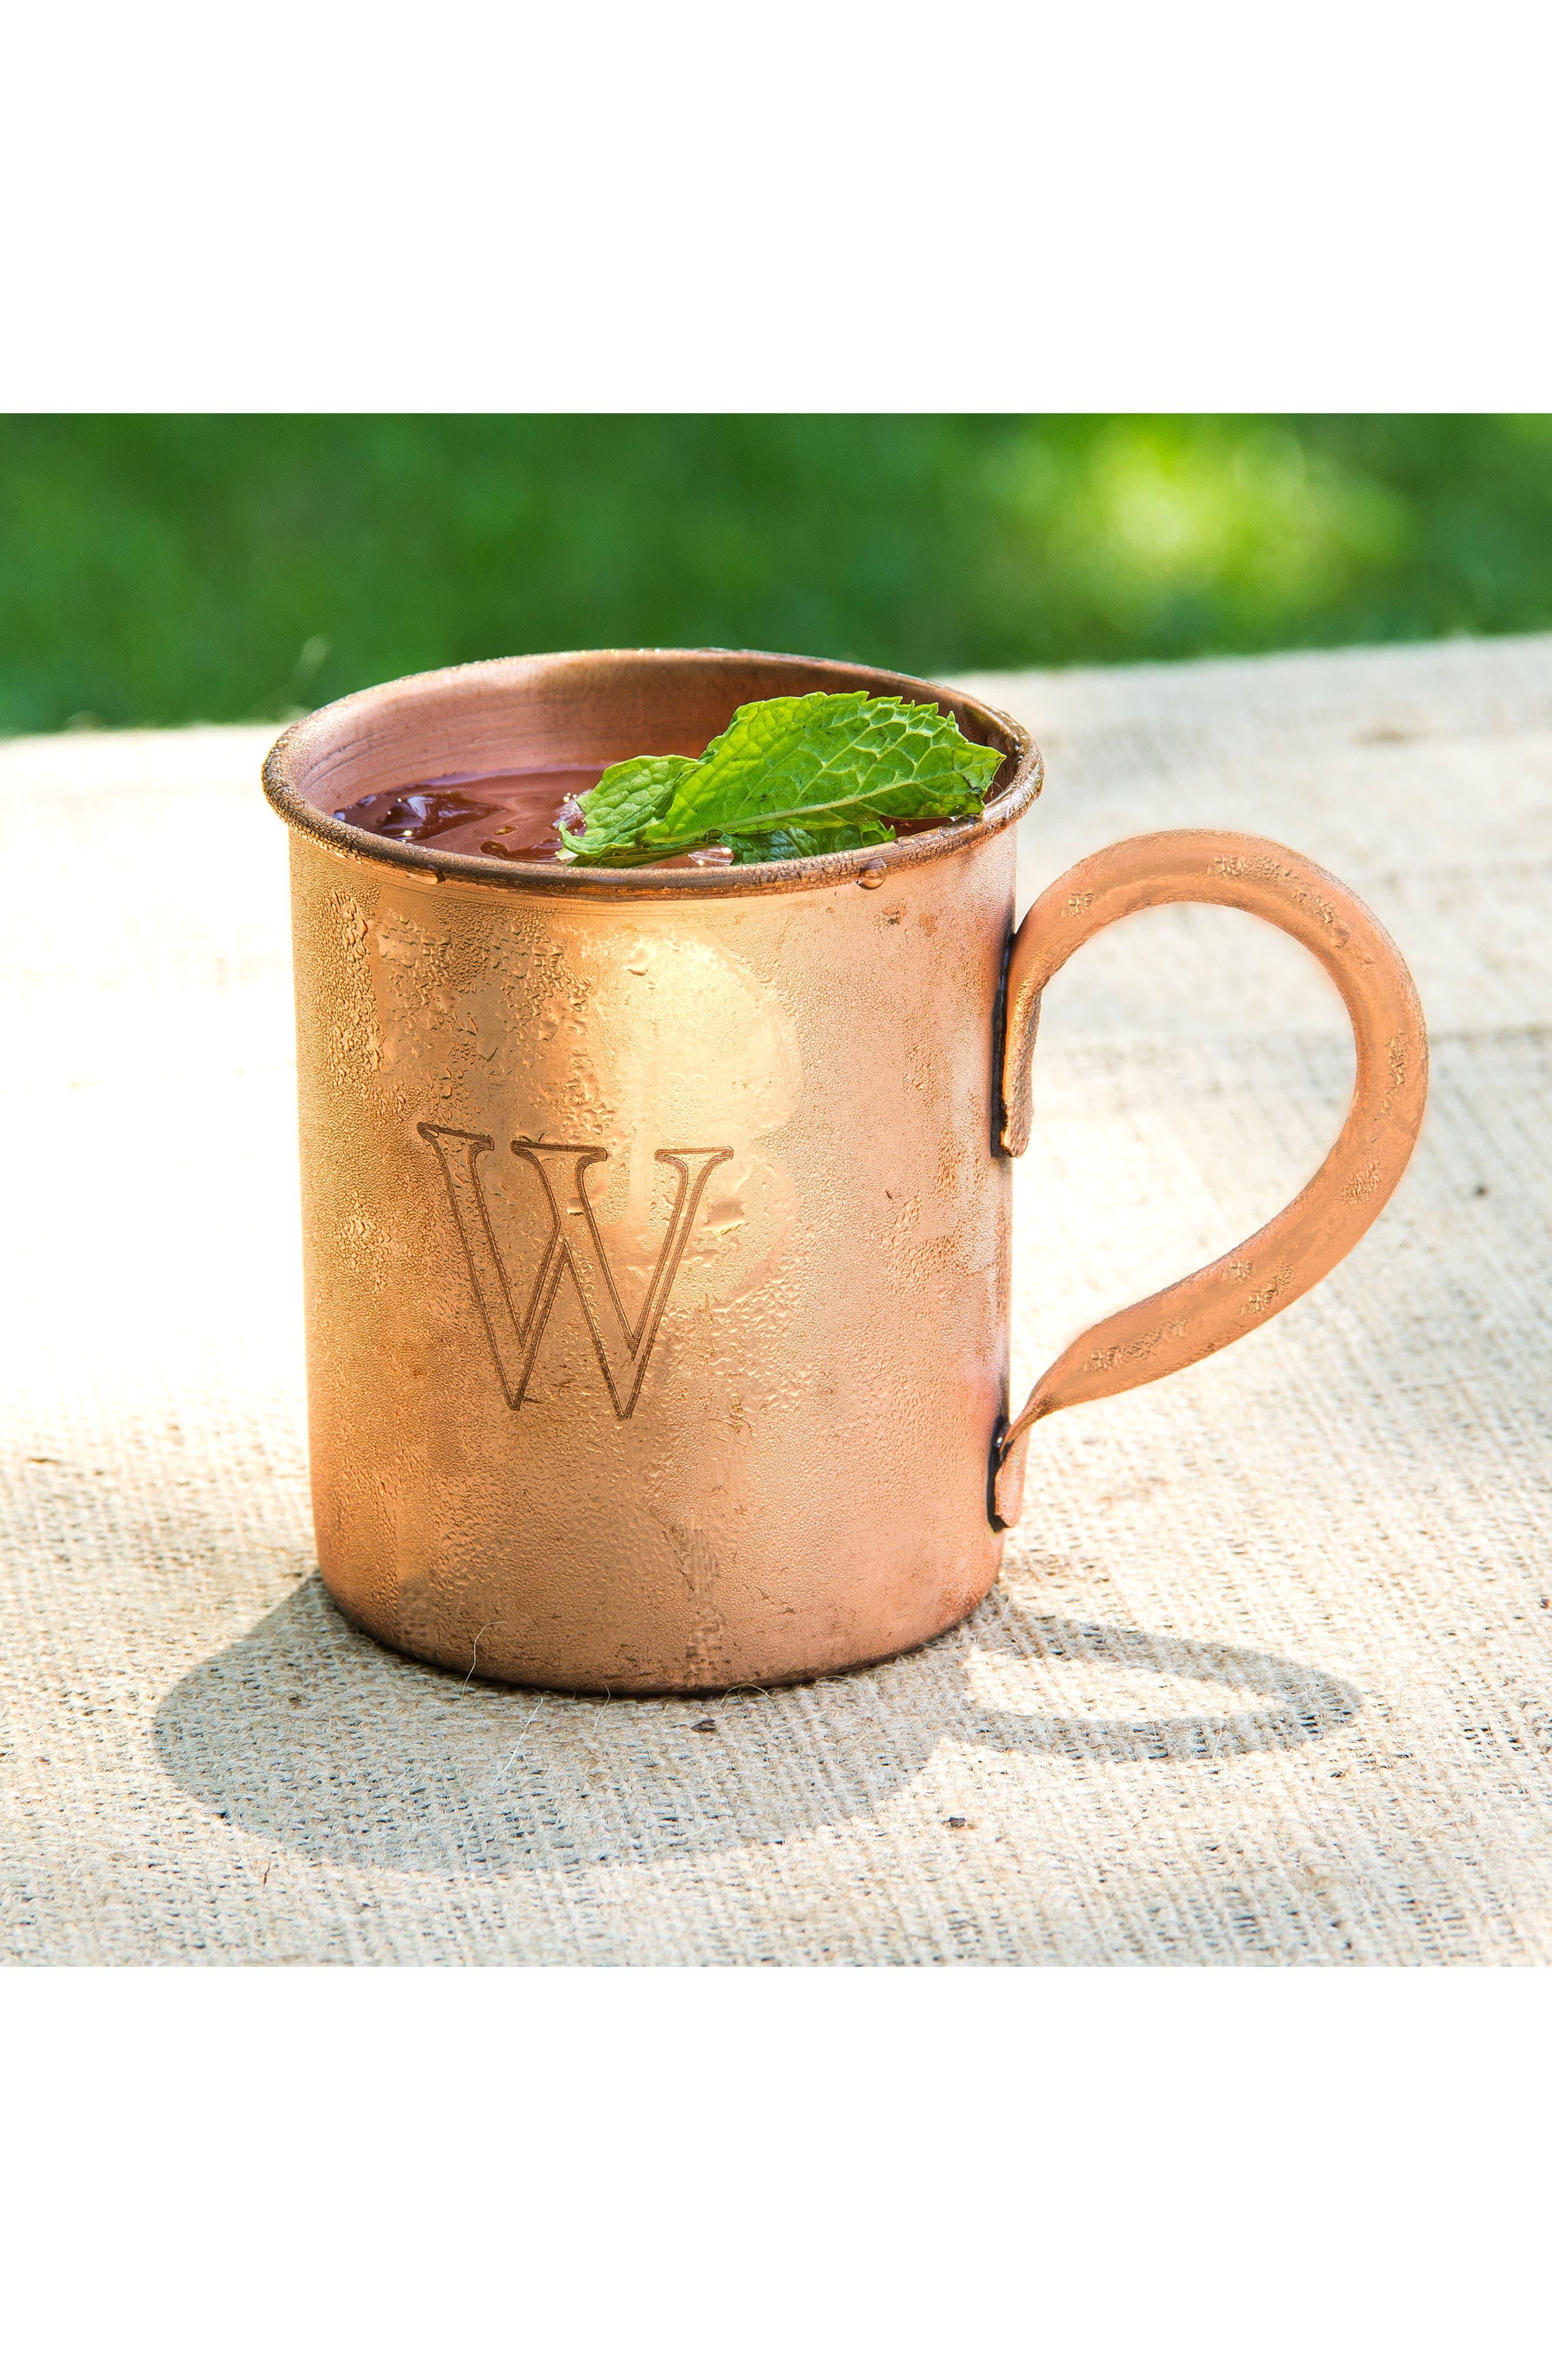 Monogram Moscow Mule Copper Mug,                             Alternate thumbnail 5, color,                             243